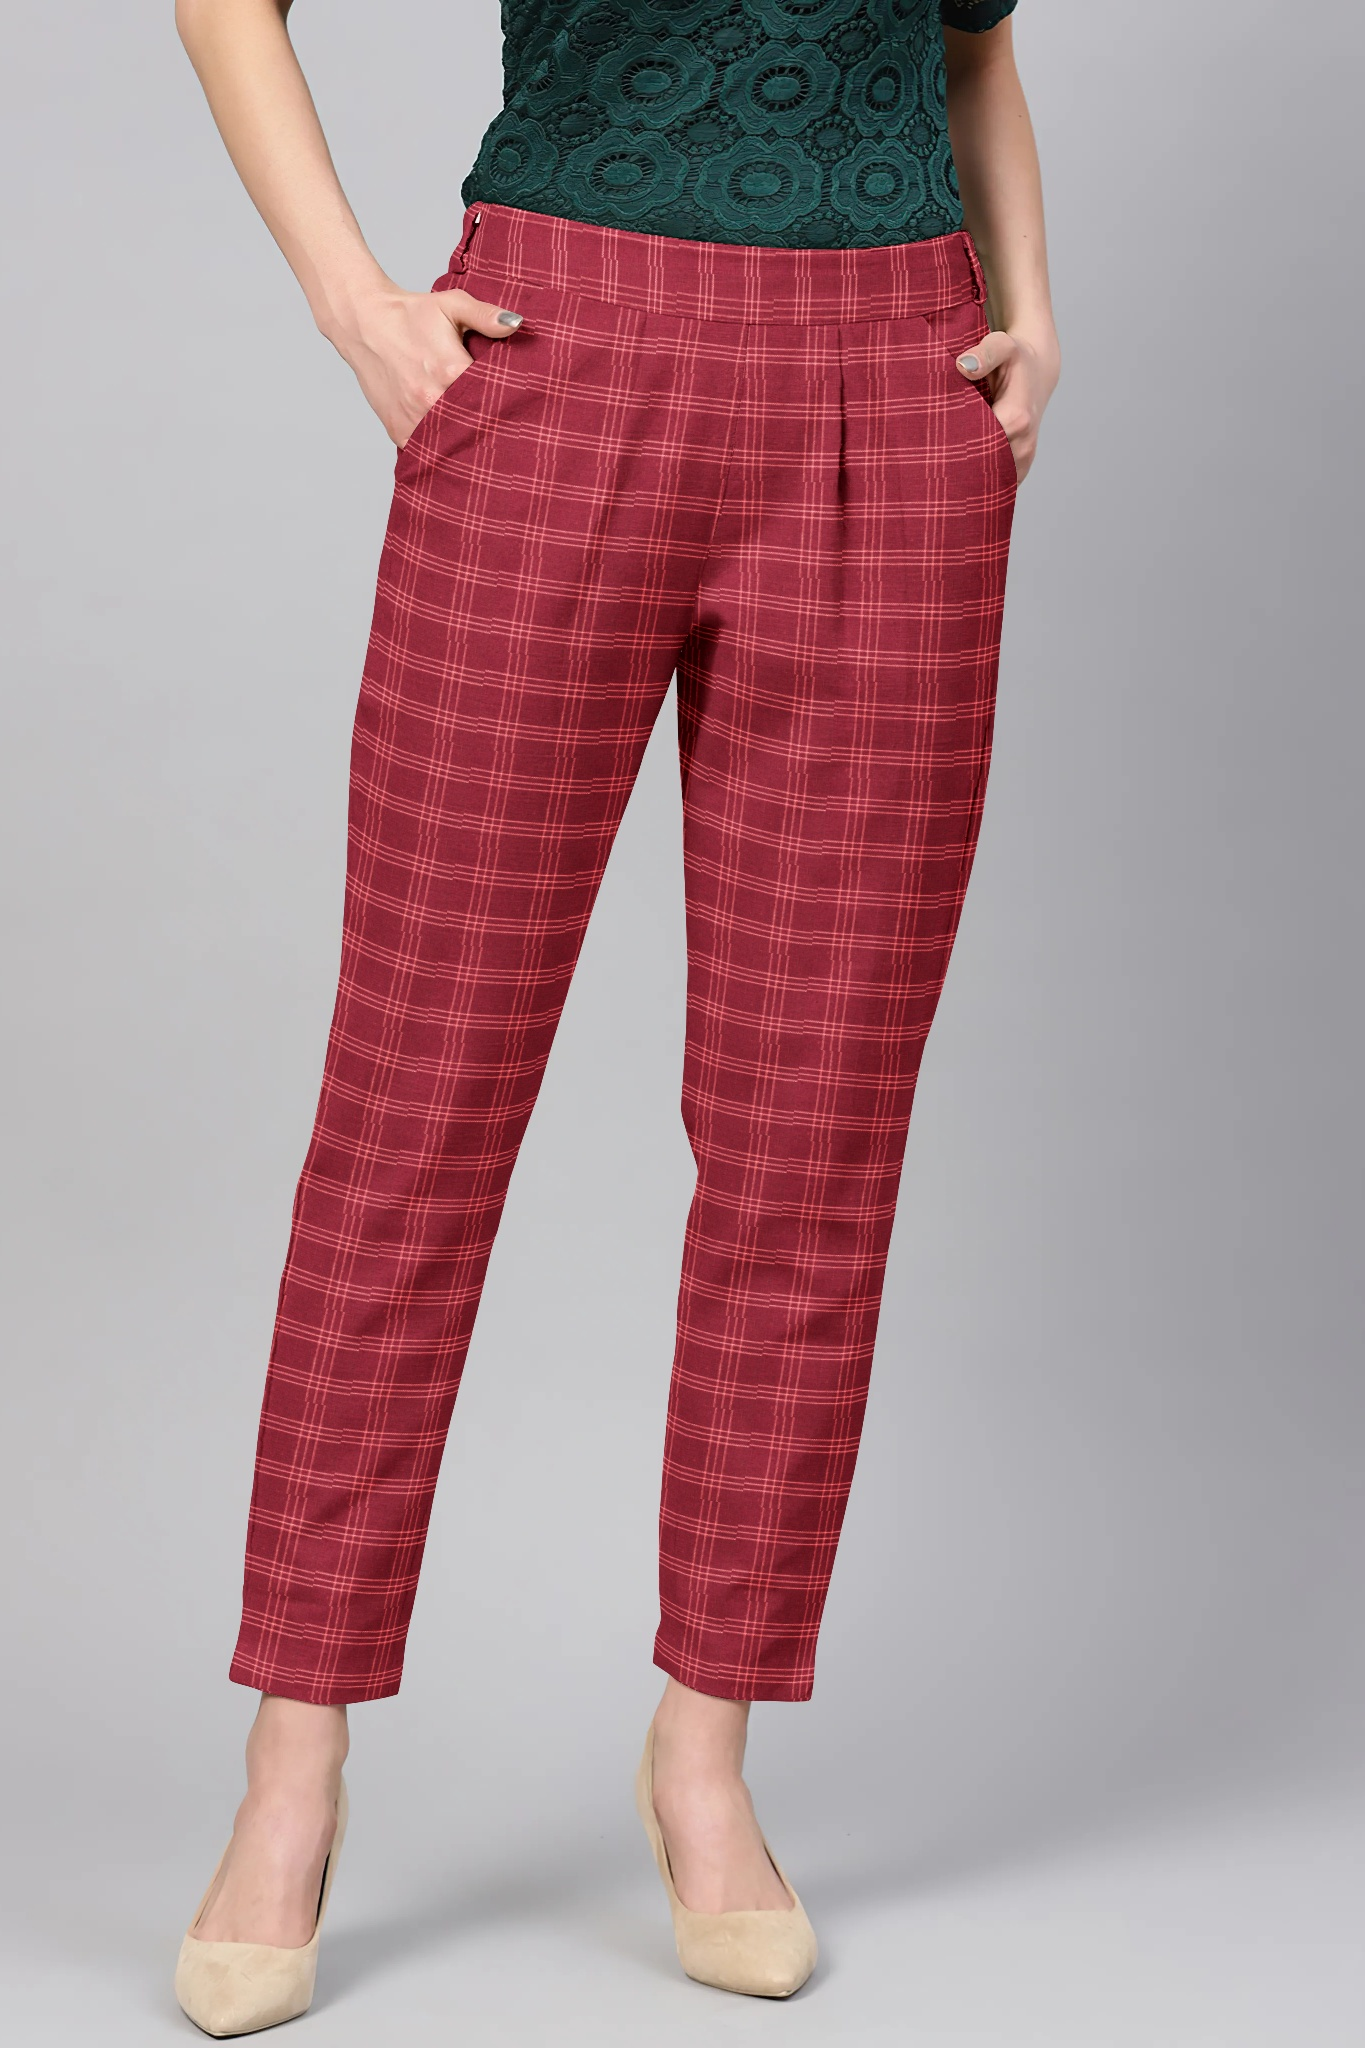 /home/customer/www/fabartcraft.com/public_html/uploadshttps://www.shopolics.com/uploads/images/medium/Maroon-White-Cotton-Check-Regular-Fit-Solid-Trouser-36098.jpg